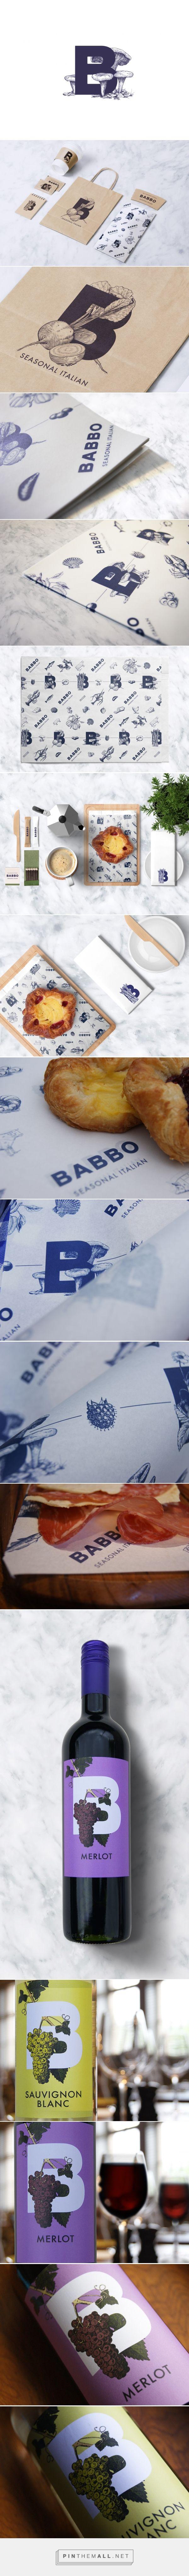 BABBO - Seasonal Italian - Packaging of the World - Creative Package Design Gallery - http://www.packagingoftheworld.com/2016/11/babbo-seasonal-italian.html